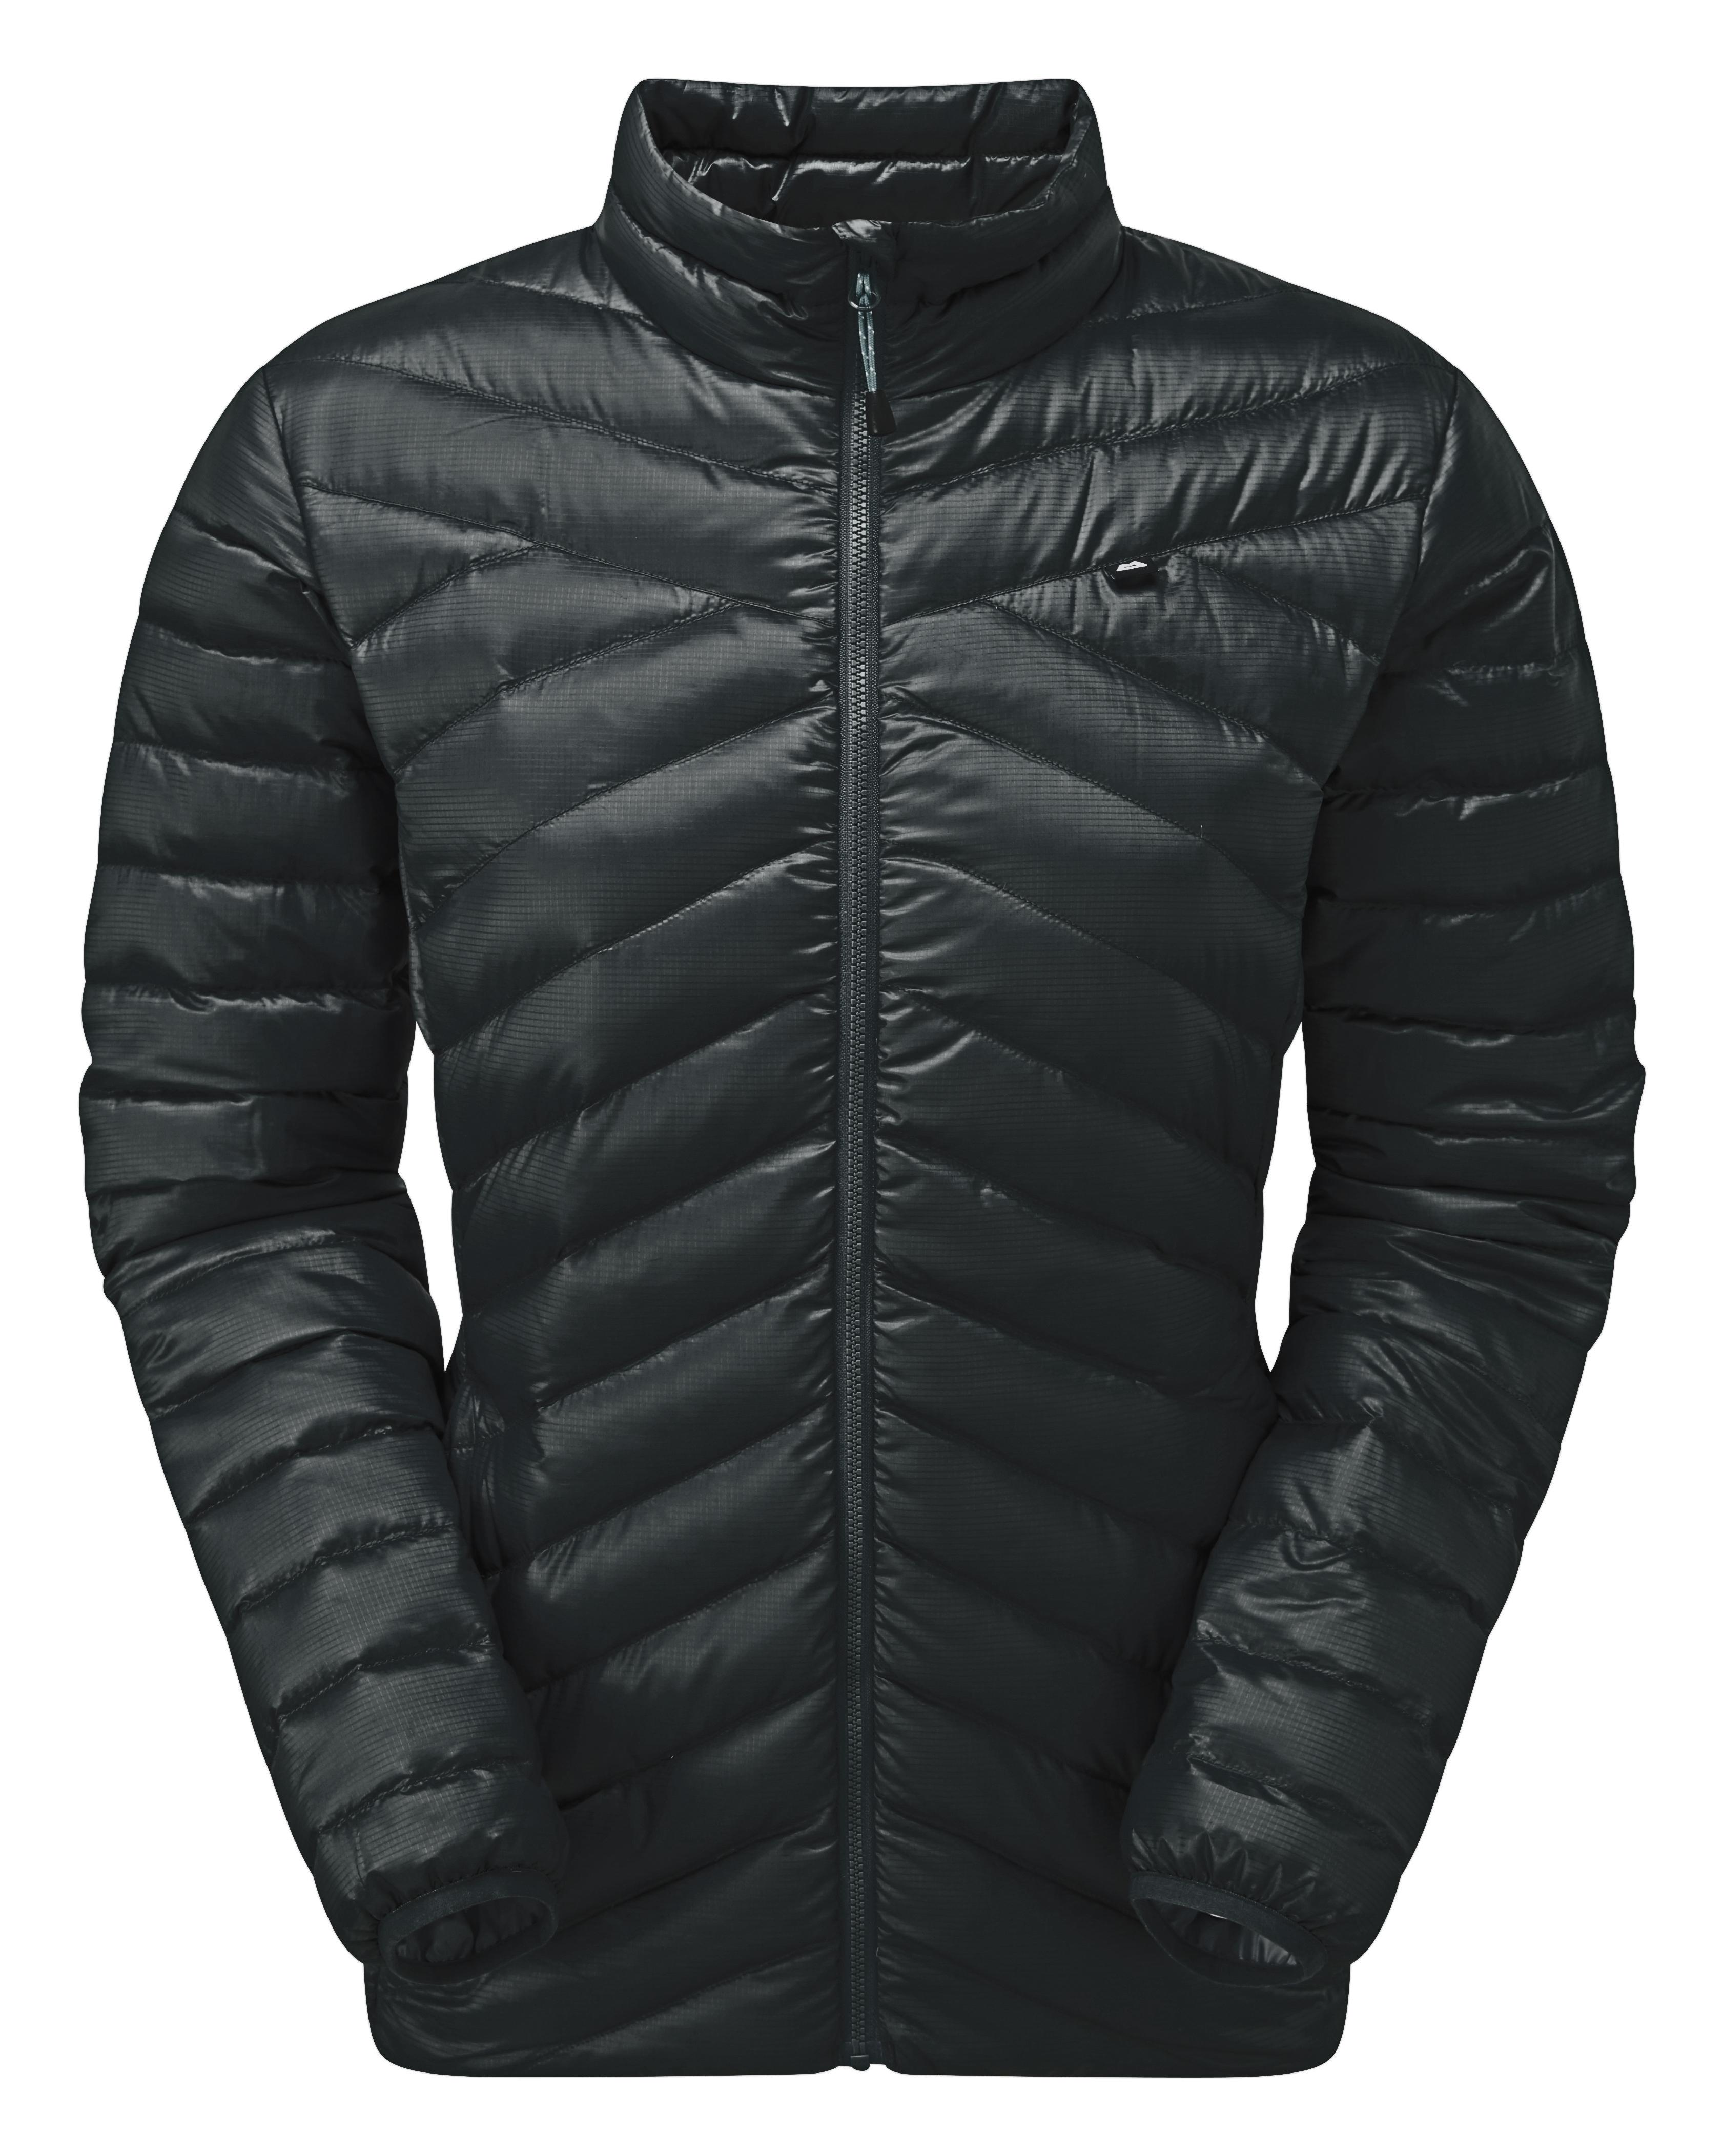 Earthrise Wmn Jacket